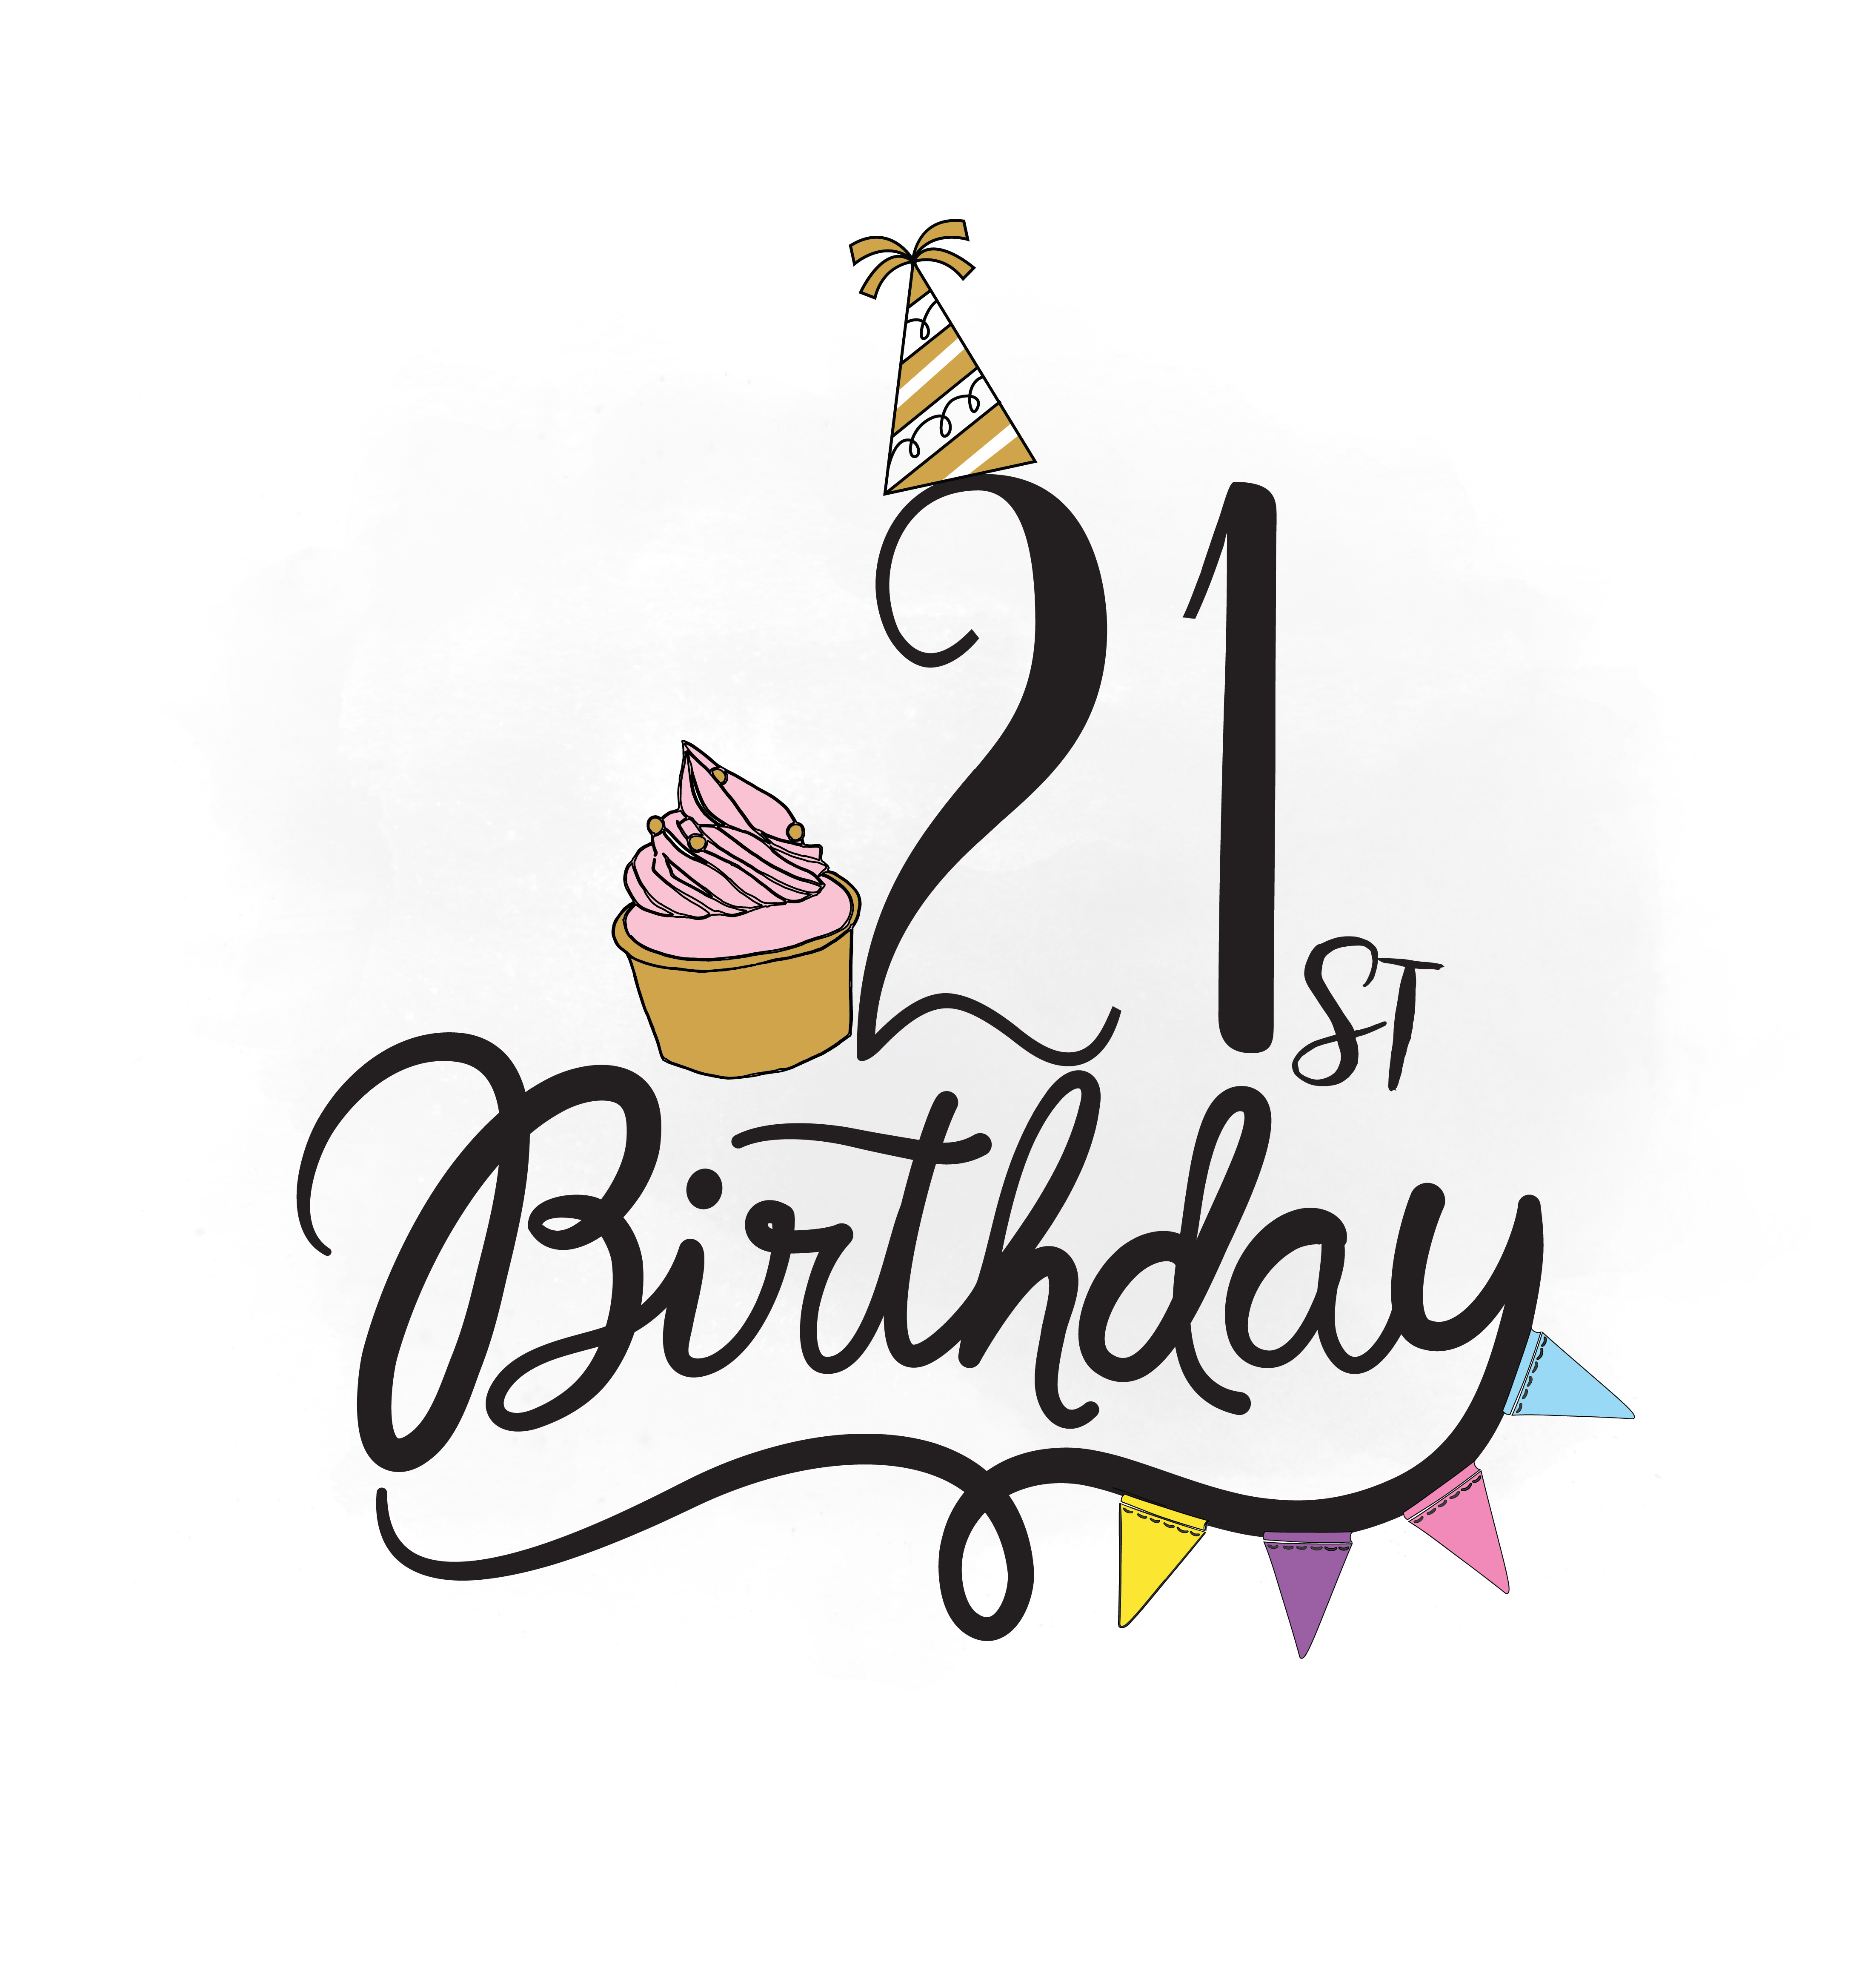 4375x4670 21st Birthday Svg Clipart, Birthday Quo Design Bundles